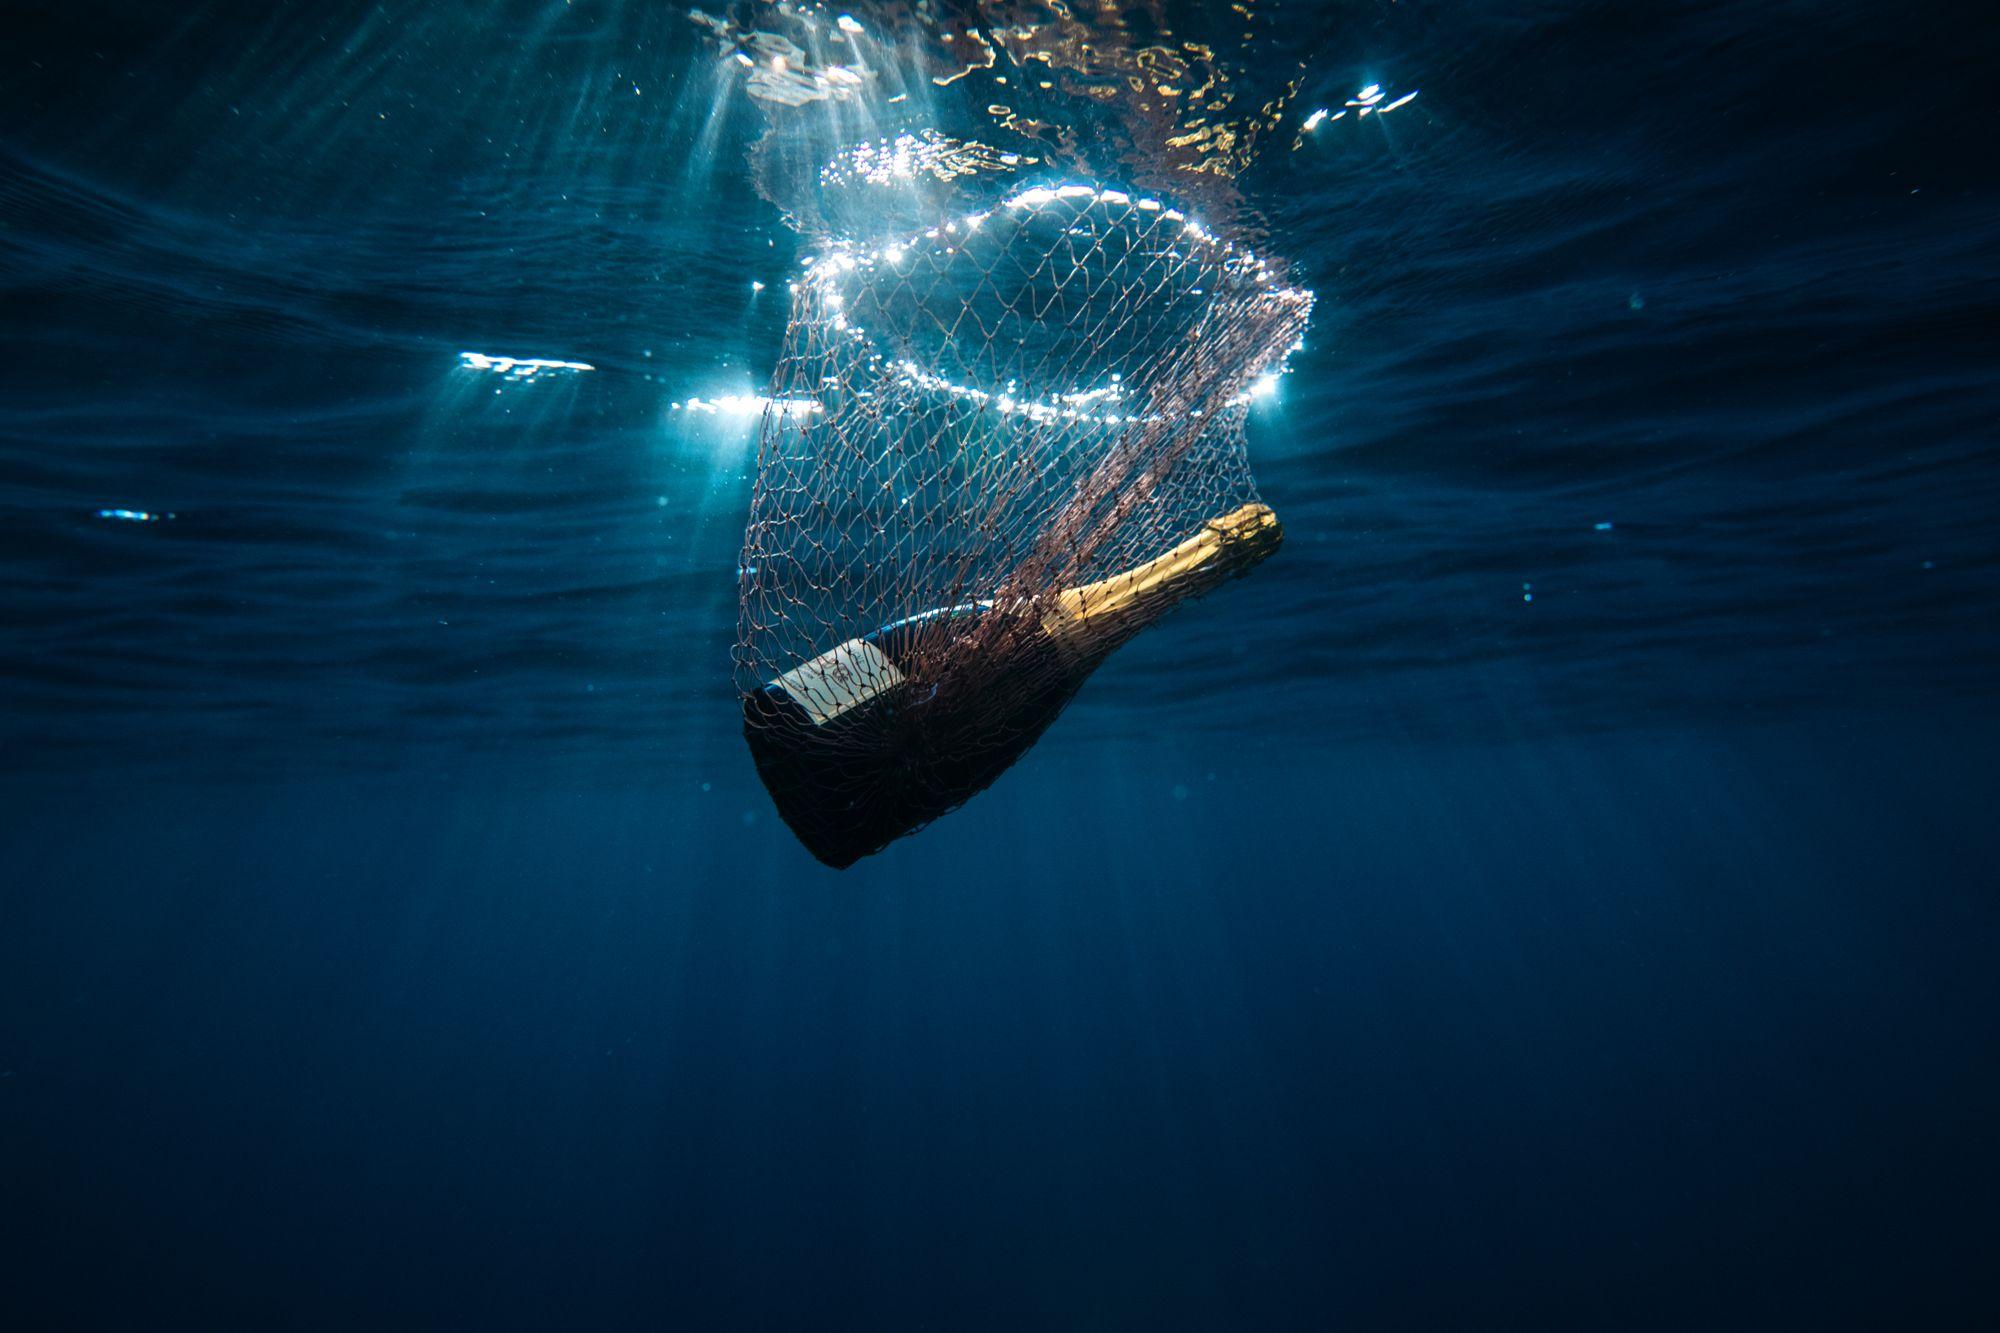 Krug x Fish Celebrates The Unique Bounties Of The Sea